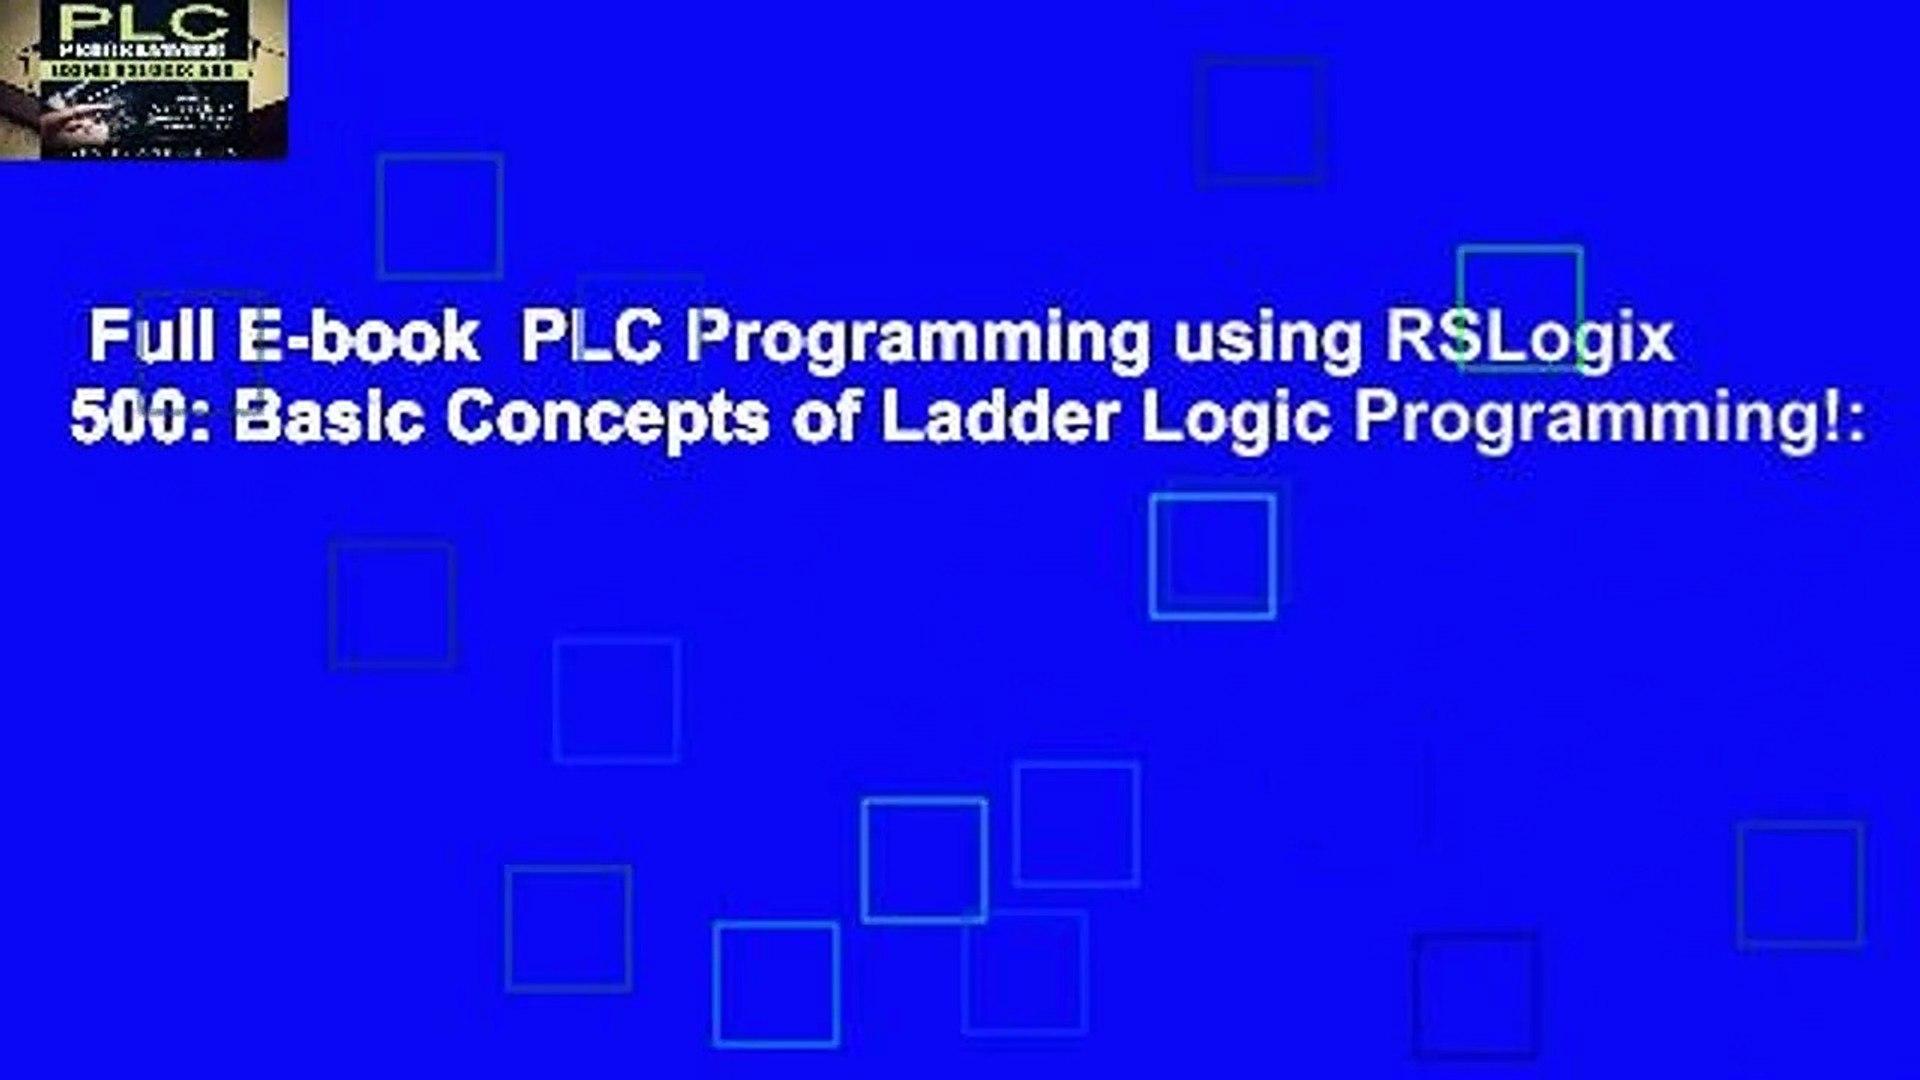 Full E-book PLC Programming using RSLogix 500: Basic Concepts of Ladder  Logic Programming!: